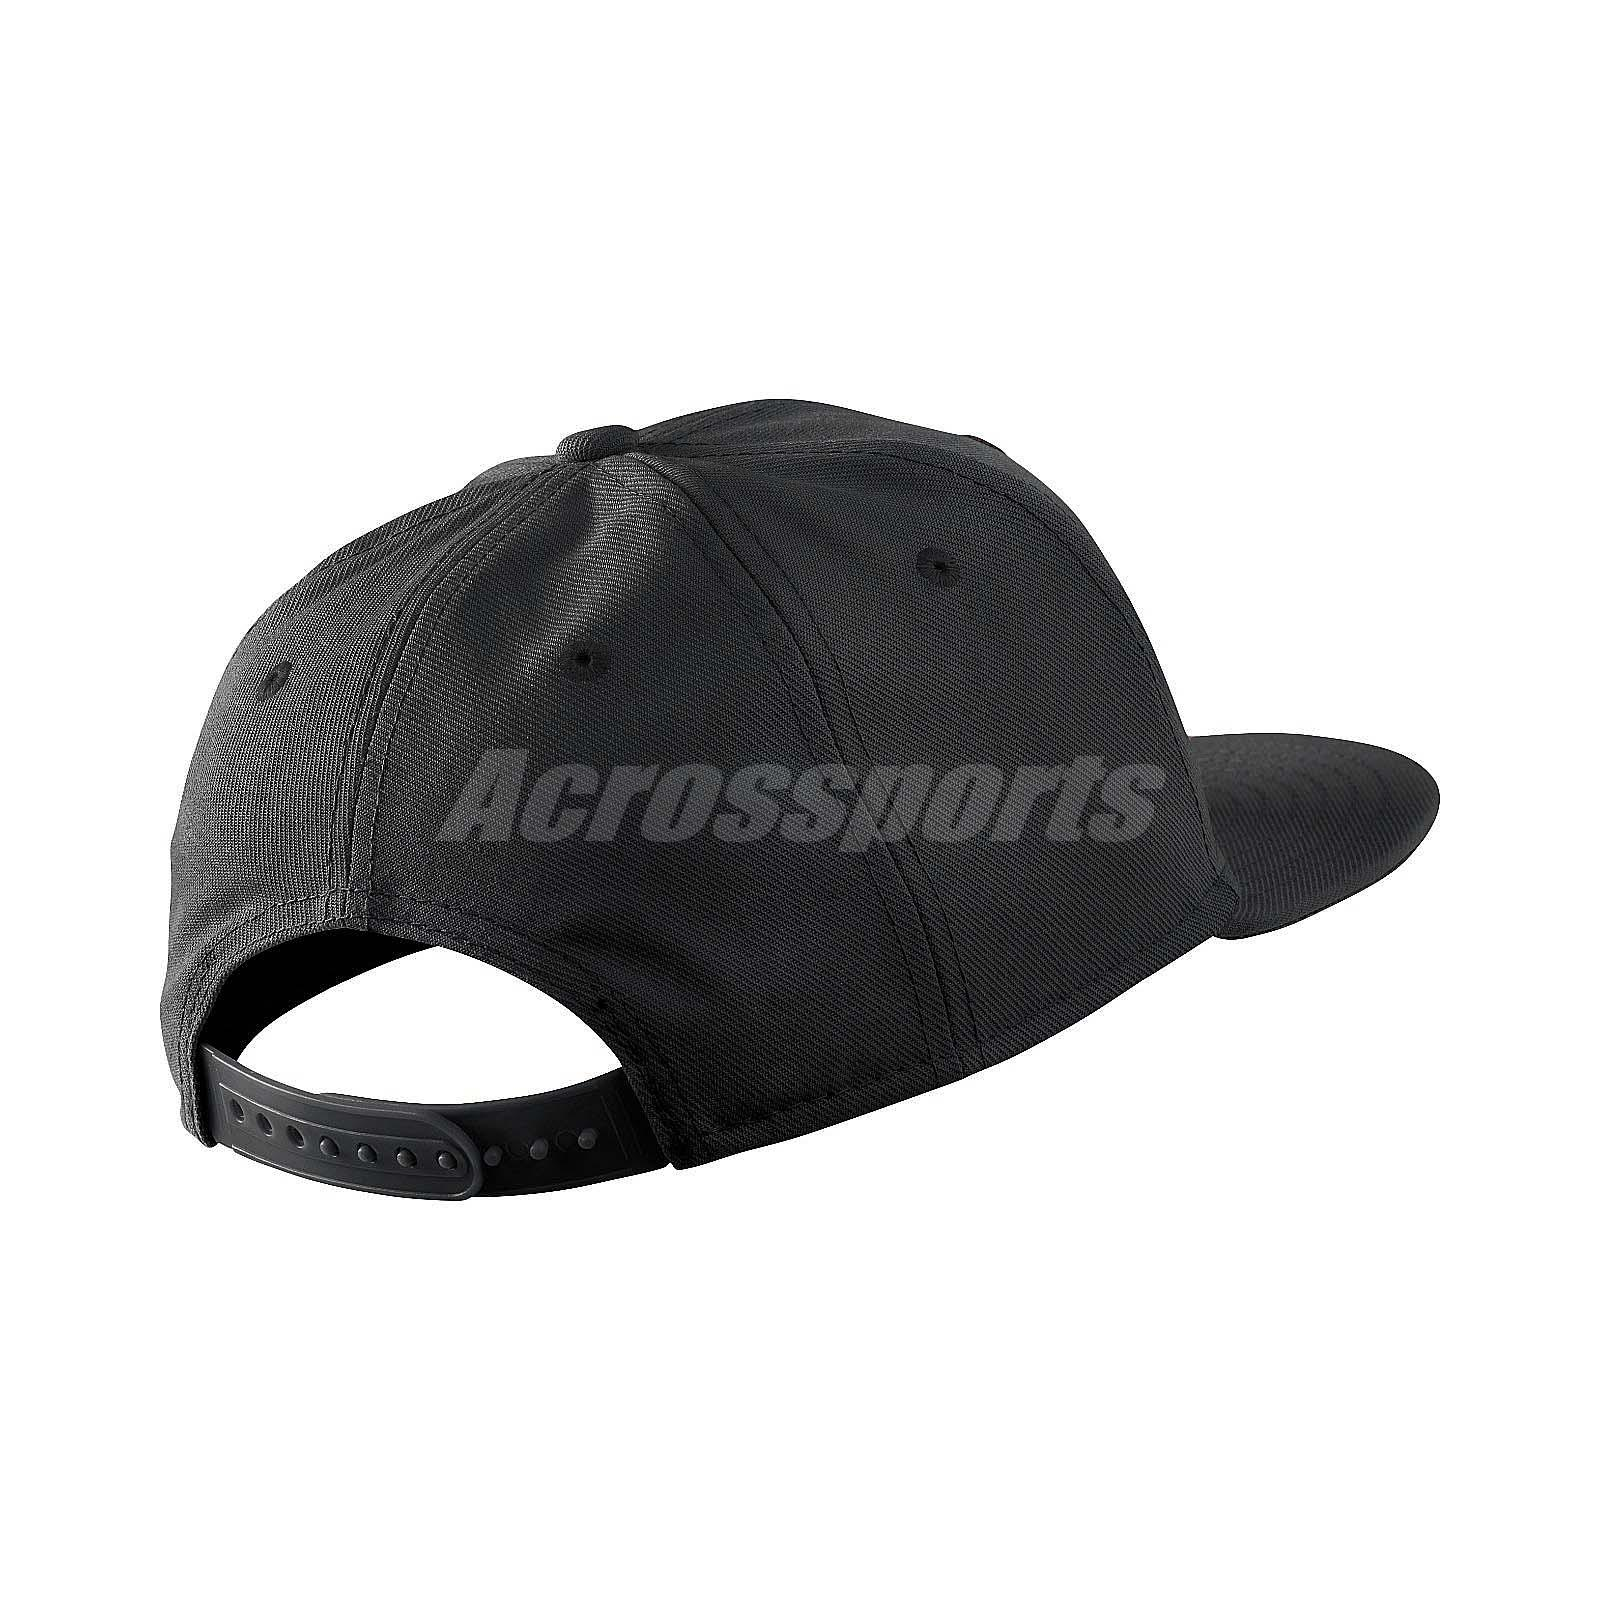 Nike True Cap Futura Snapback Hat Black White Sports Running ... cdd3a70616f7